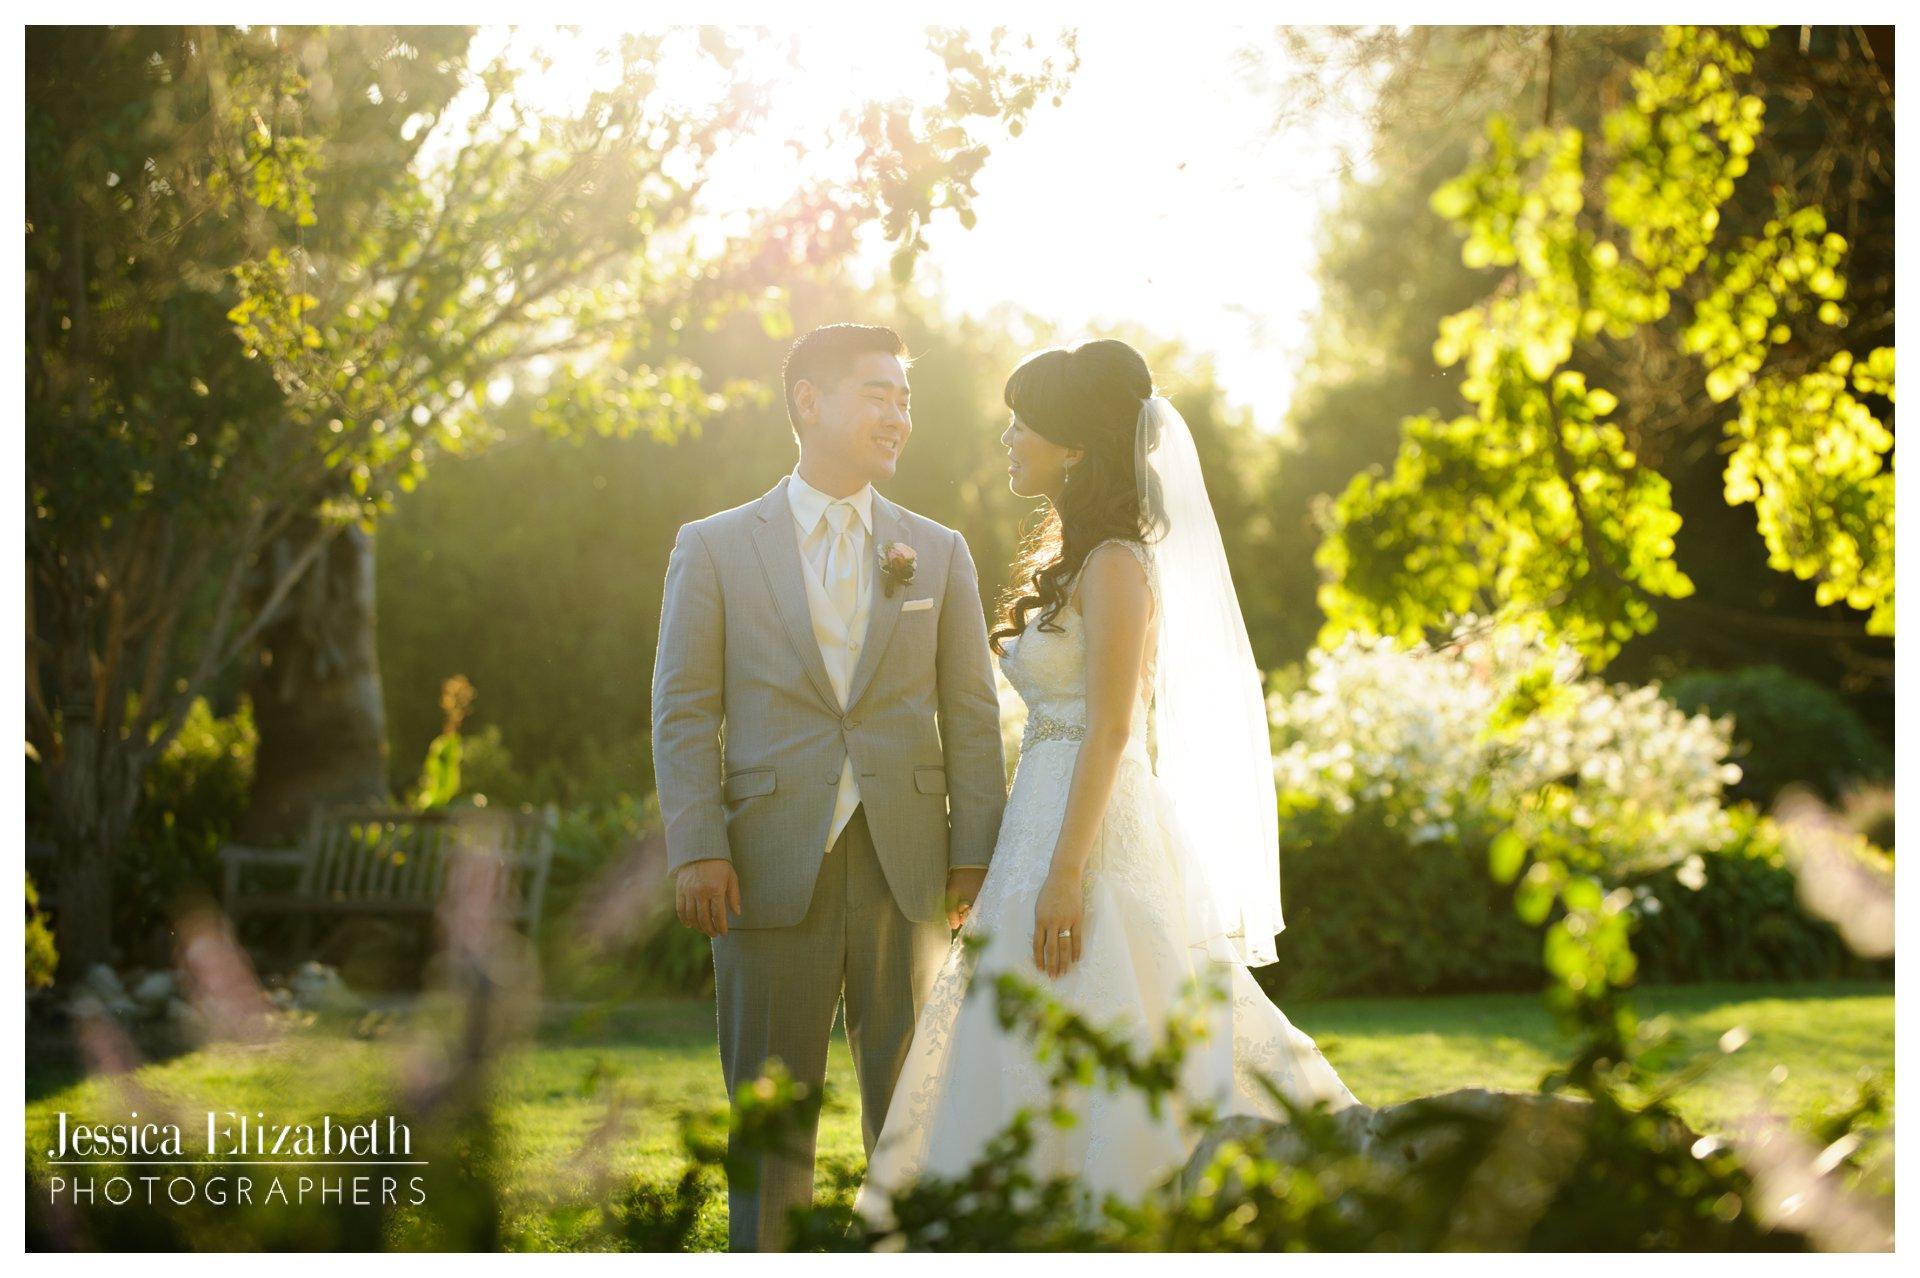 29-South Coast Botanic Garden Palos Verdes Wedding Photography by Jessica Elizabeth